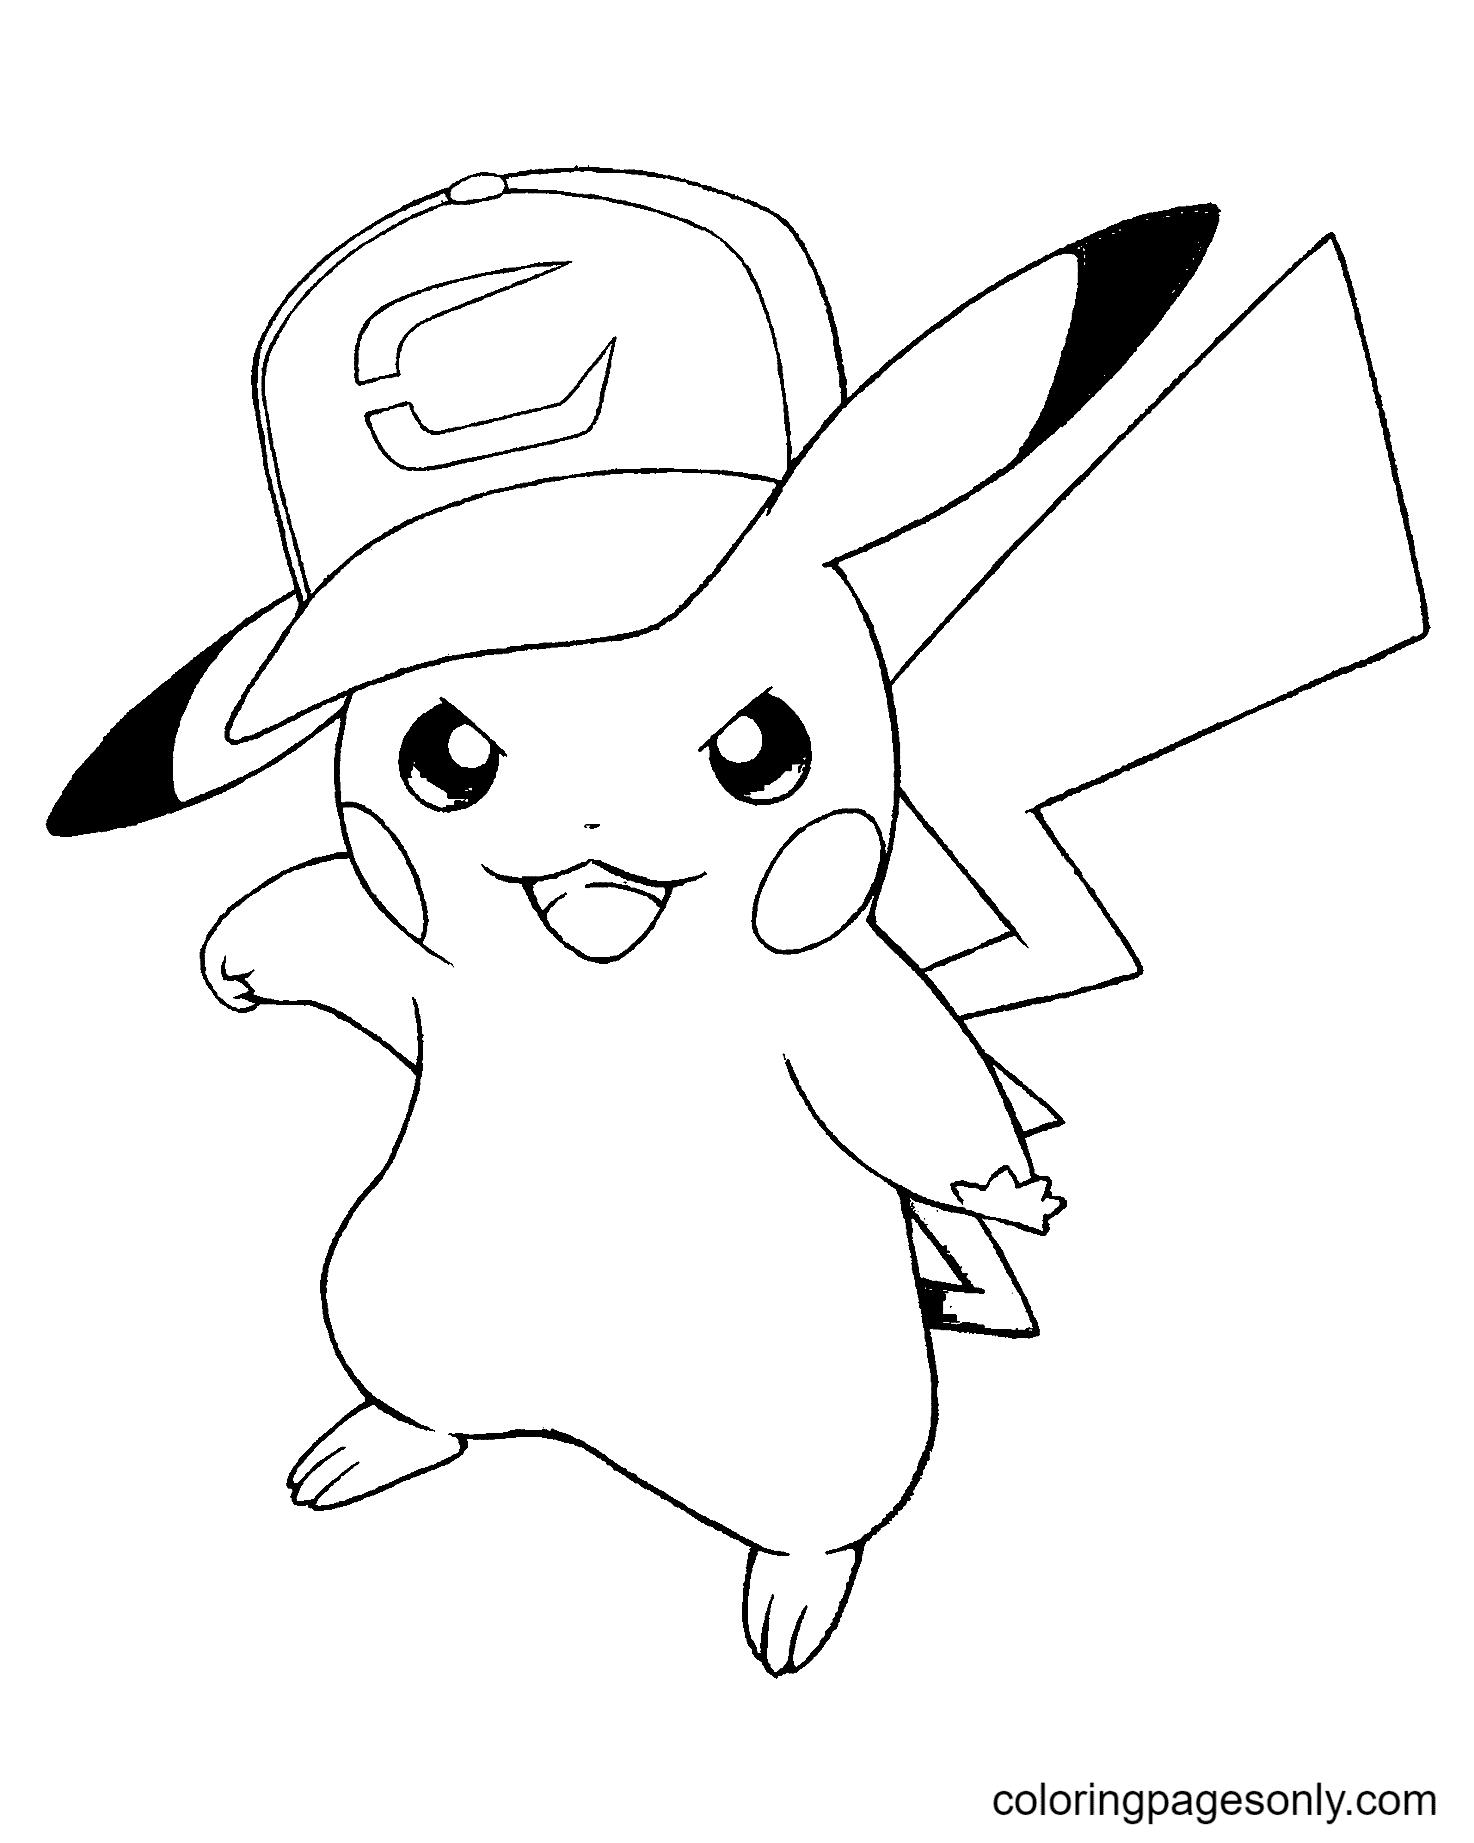 Pokemon Pikachu Wearing A Hat Coloring Page